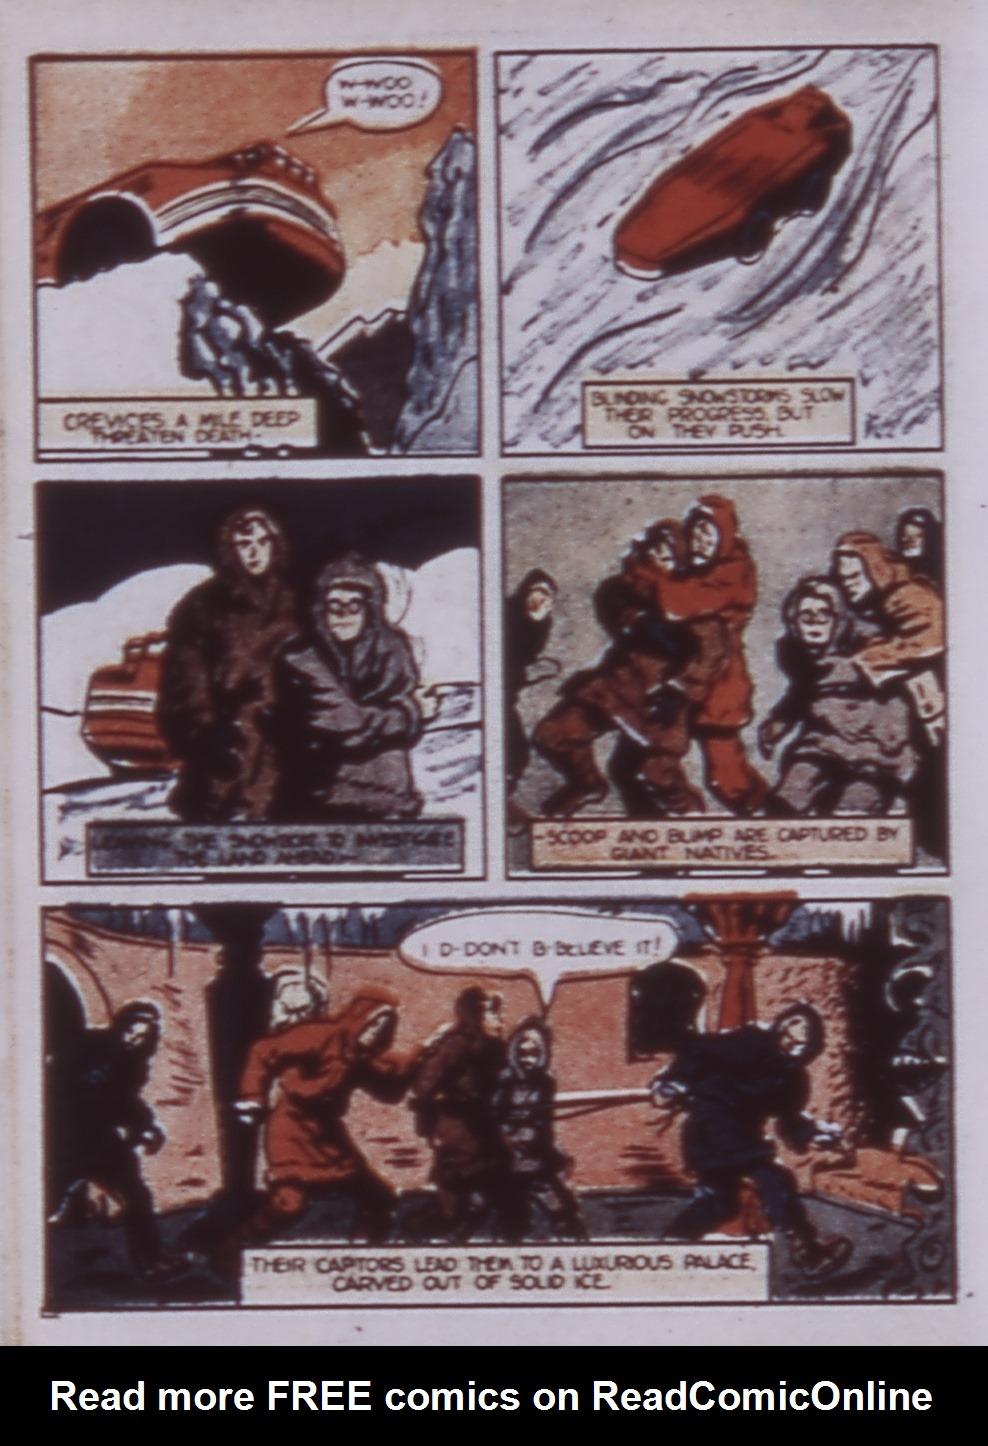 Read online WHIZ Comics comic -  Issue #3 - 30